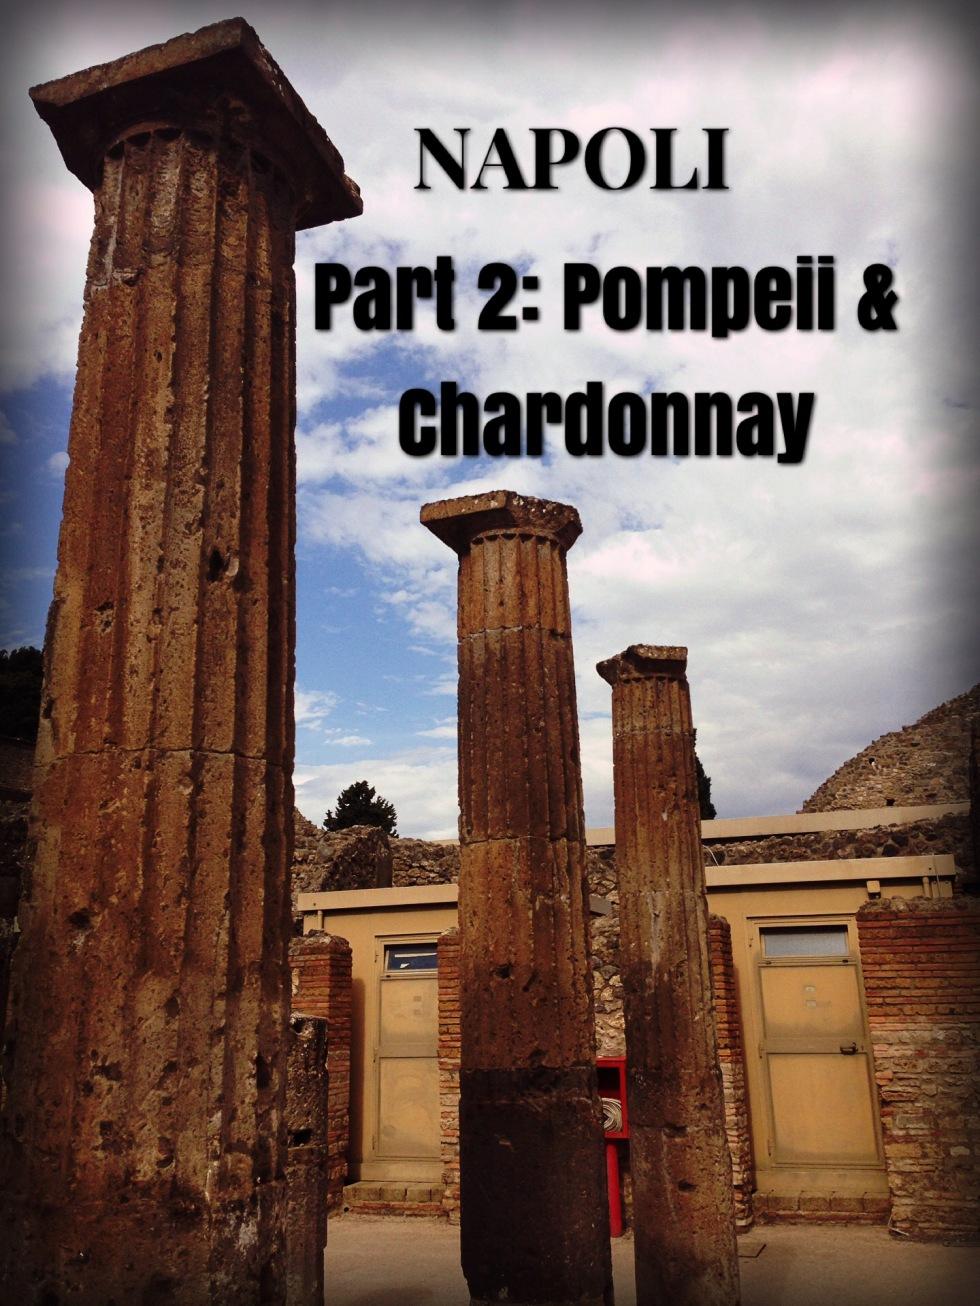 Napoli Naples Italy Italia Trip Pompeii Vesuvius Vineyard